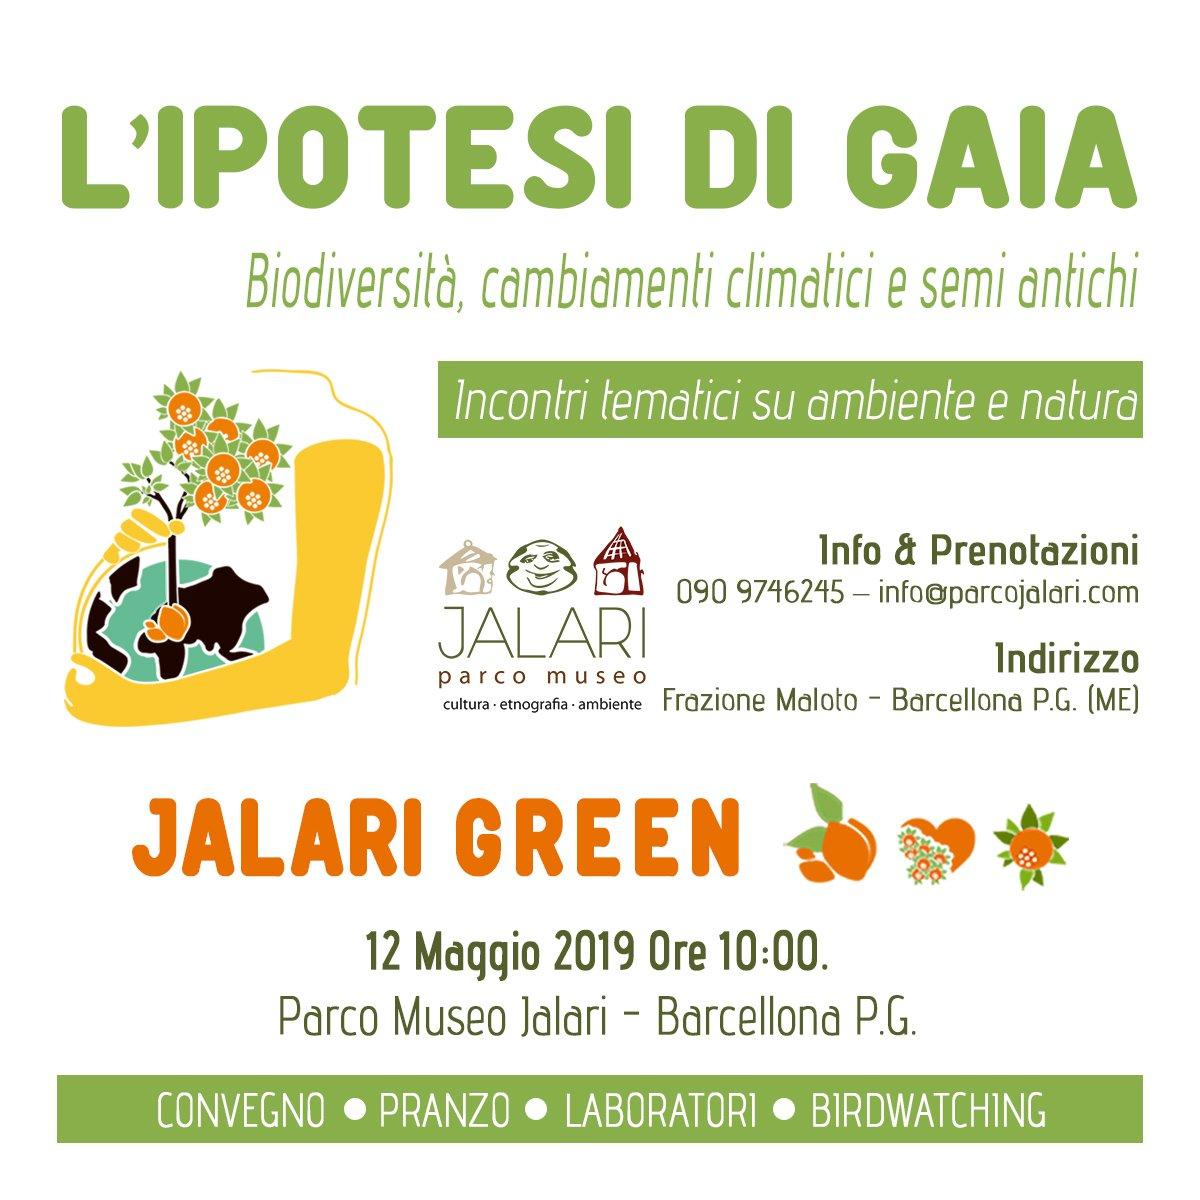 L'ipotesi di Gaia - Convegno al Parco Museo Jalari Azienda Agricola Biologica Jalari